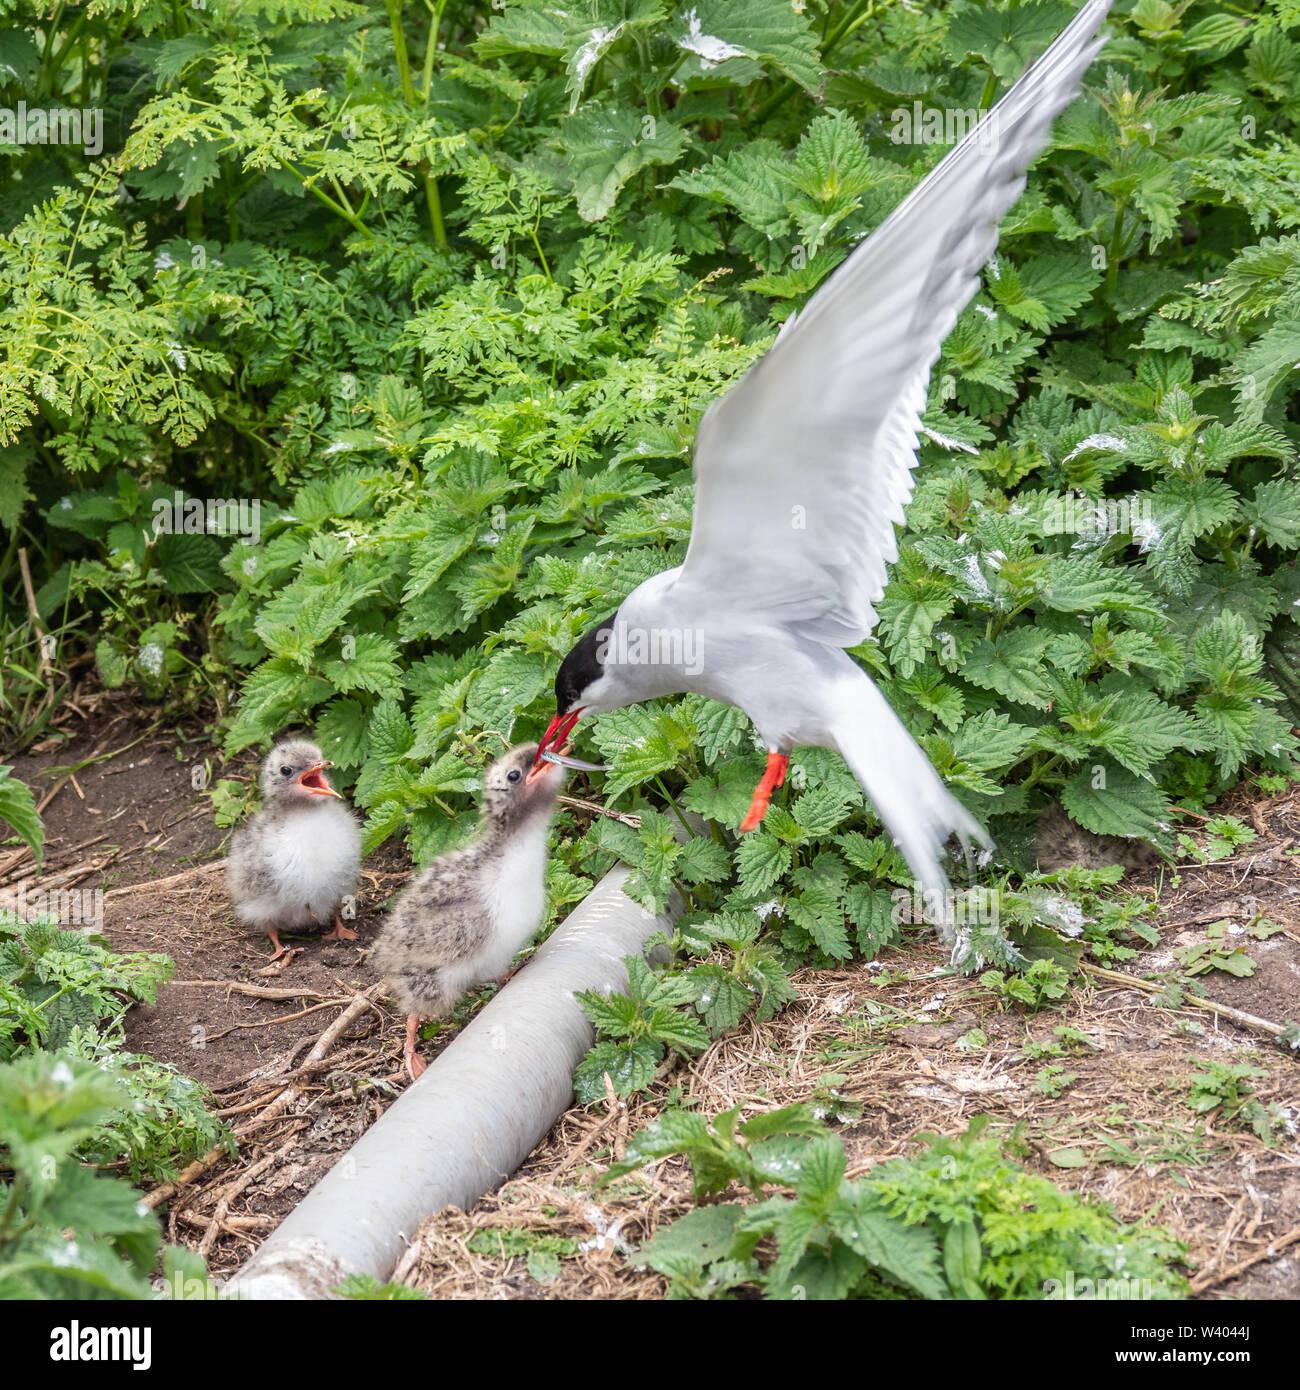 Atlantic tern in flight feeding chick - Stock Image